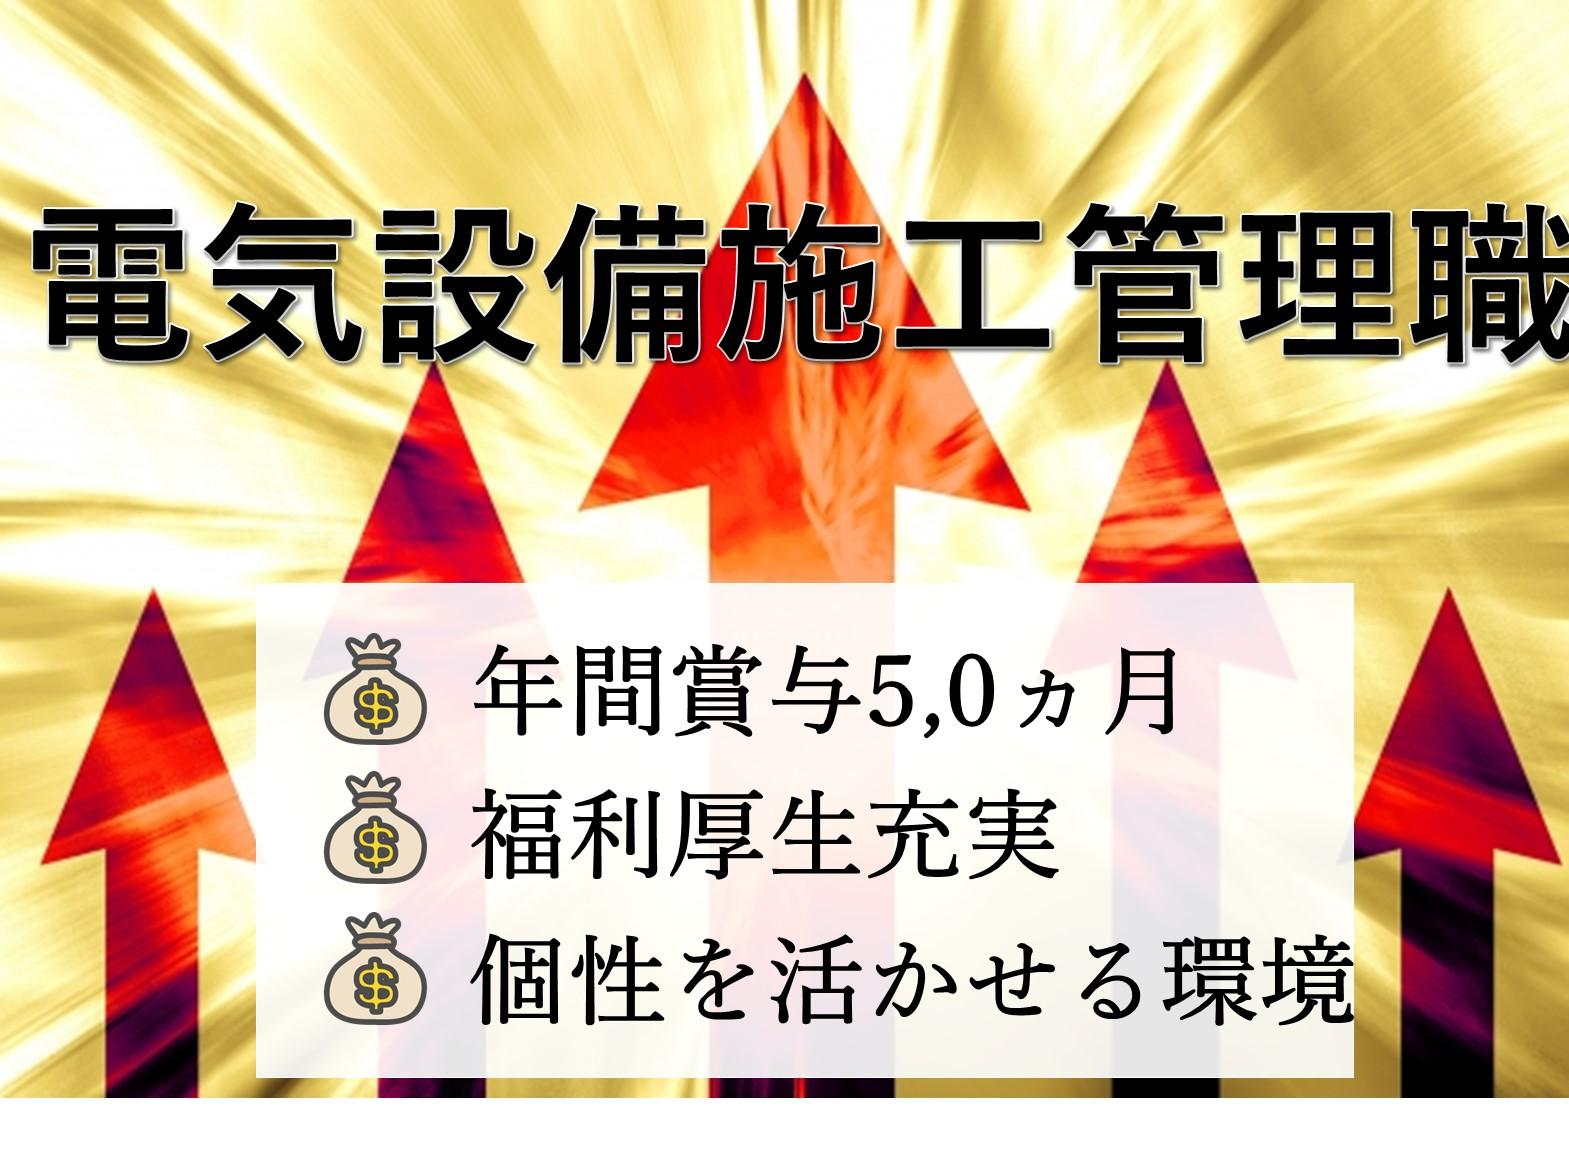 【即面談可能】年間賞与5,0ヵ月★頑張り次第で給与UP★電気設備施工管理職 イメージ